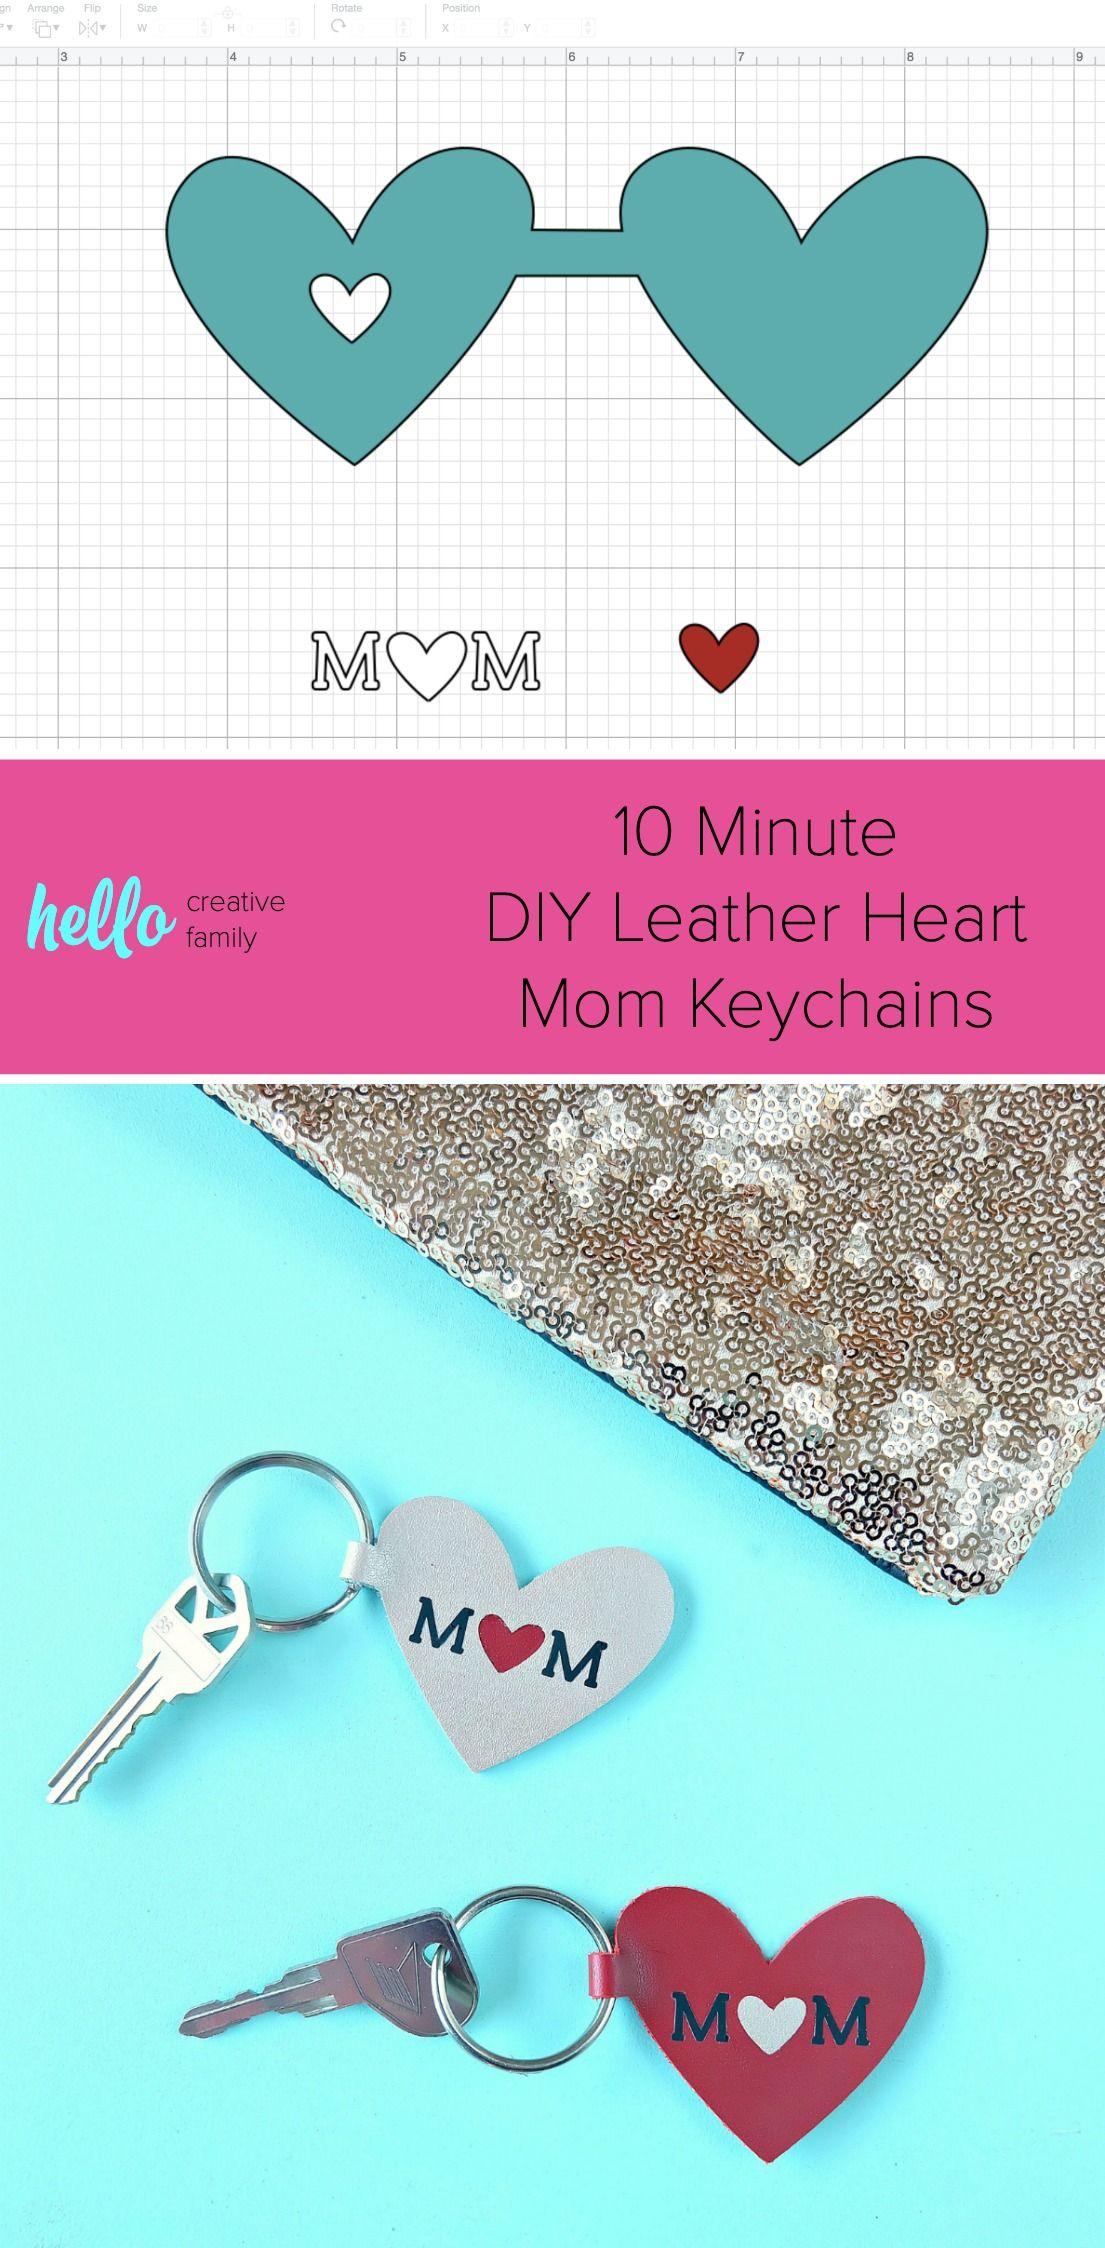 10 Minute Diy Leather Heart Mom Keychain Leather Keychain Diy